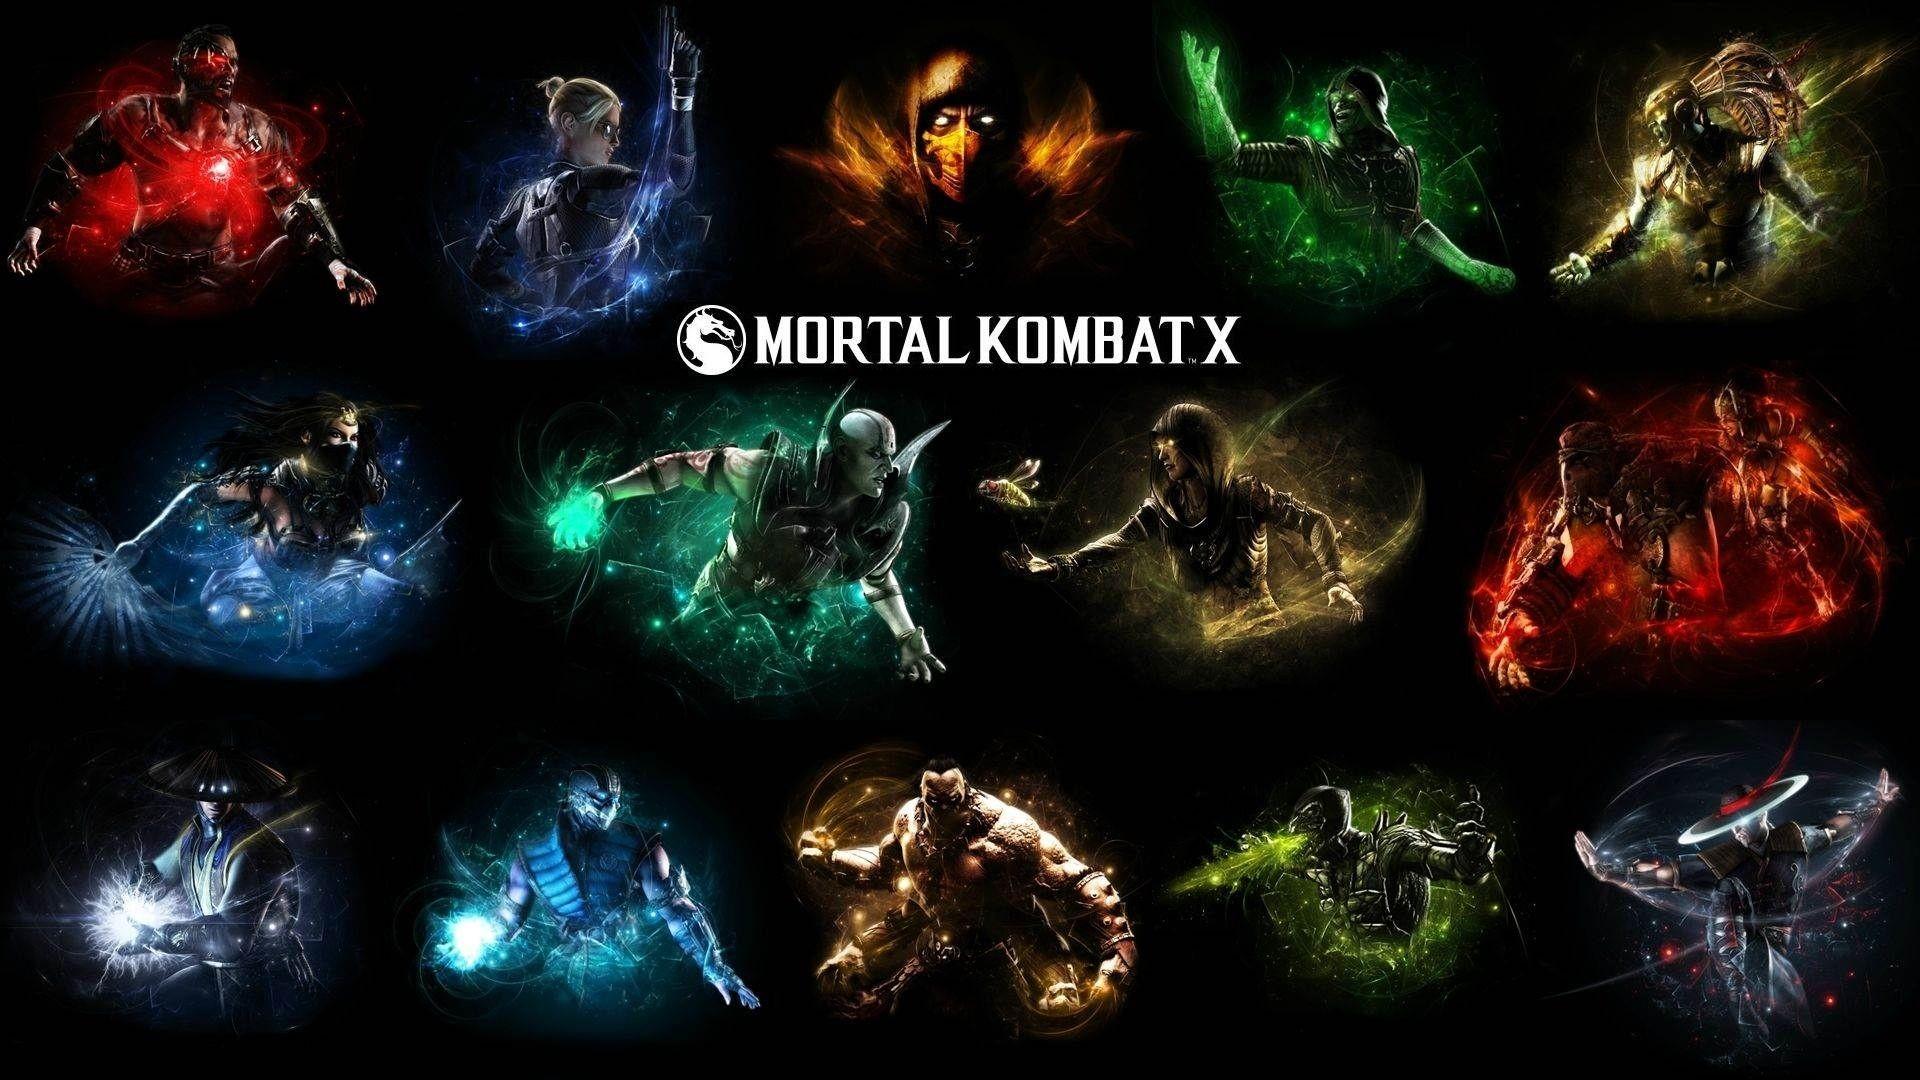 Mortal Kombat Wallpaper HD (78+ pictures)